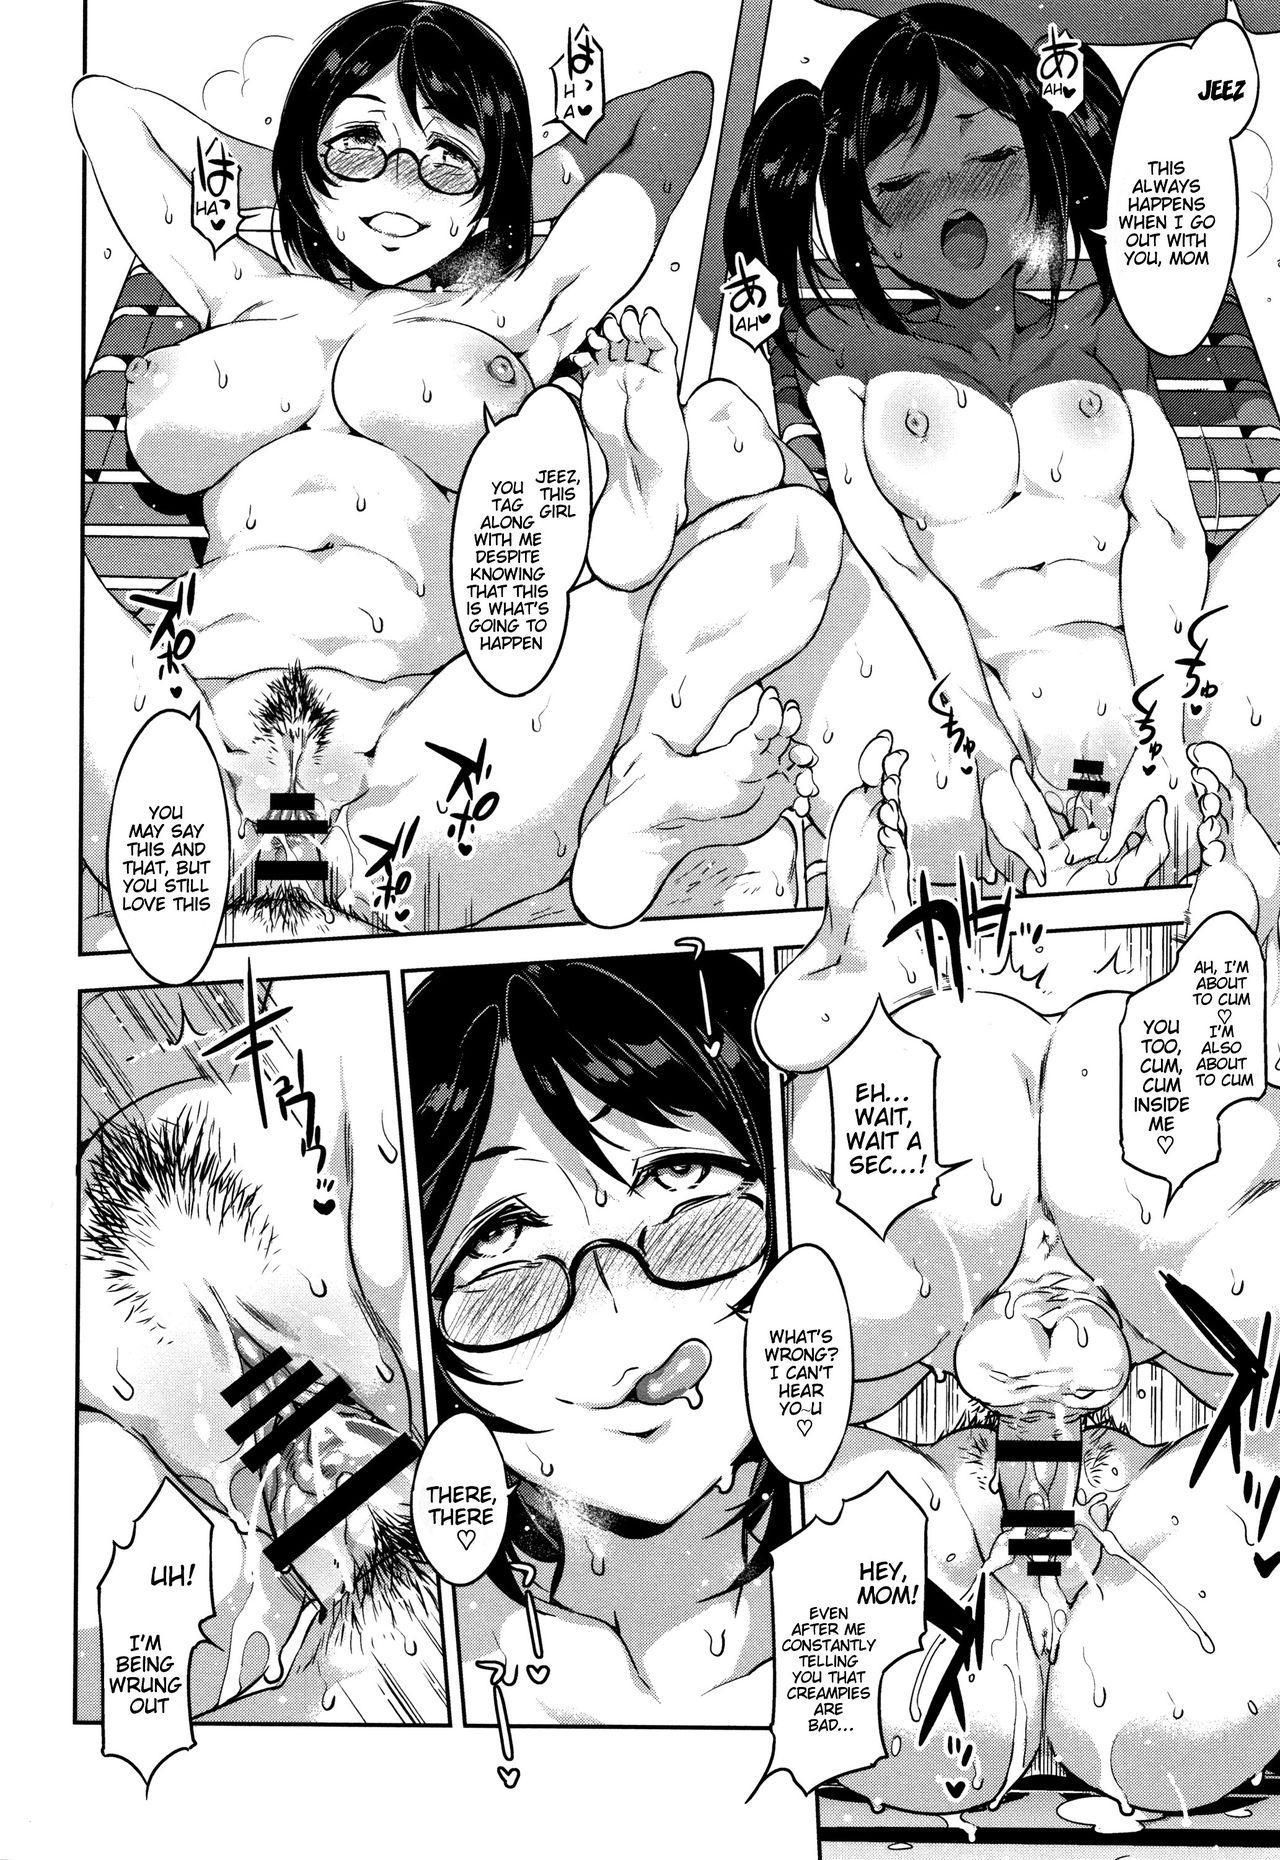 Teisou Kannen ZERO Shinsouban 1 24